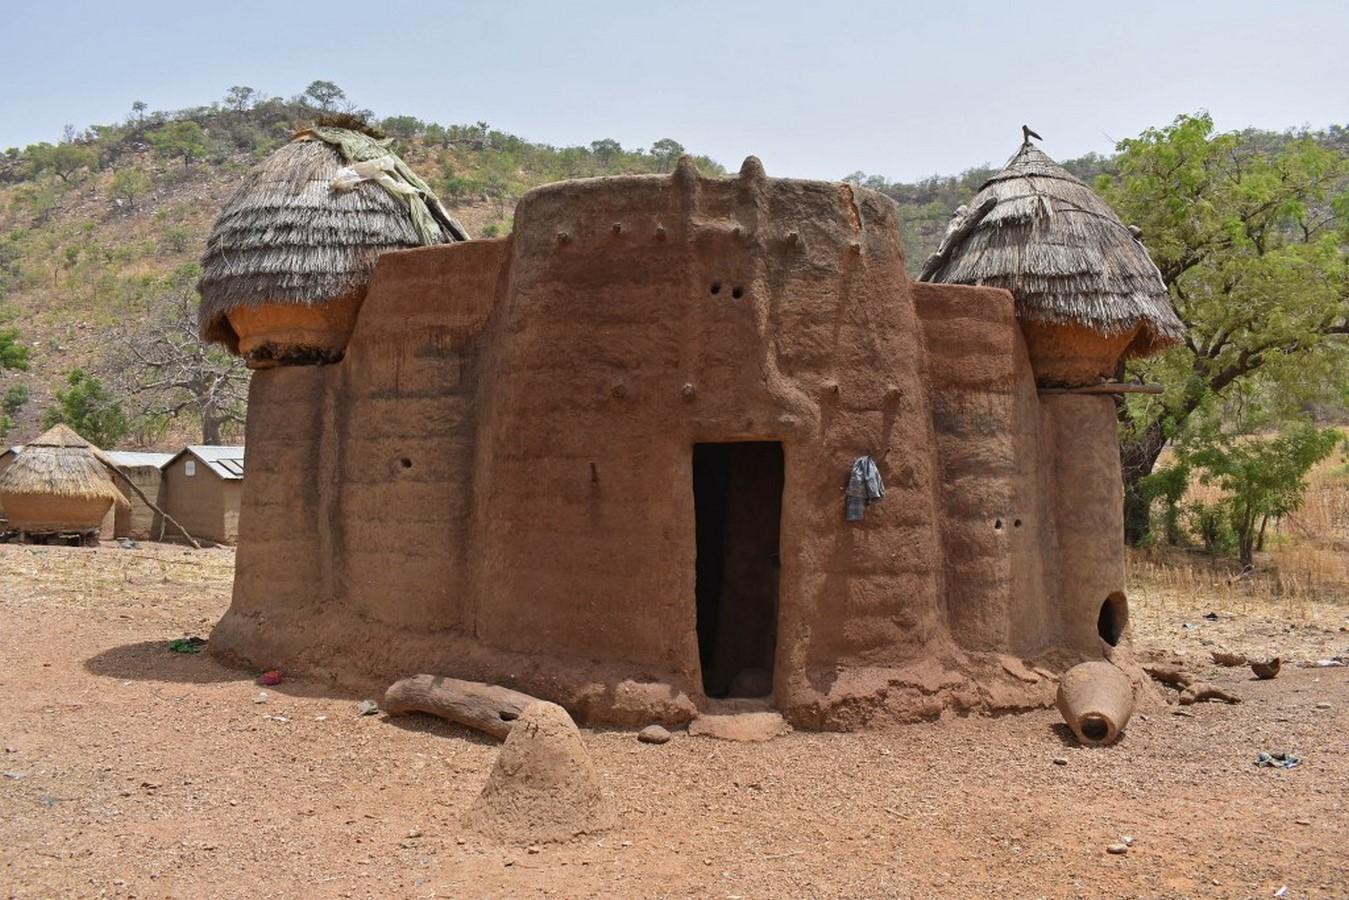 Characteristics of Sudano-Sahelian architecture - Sheet8